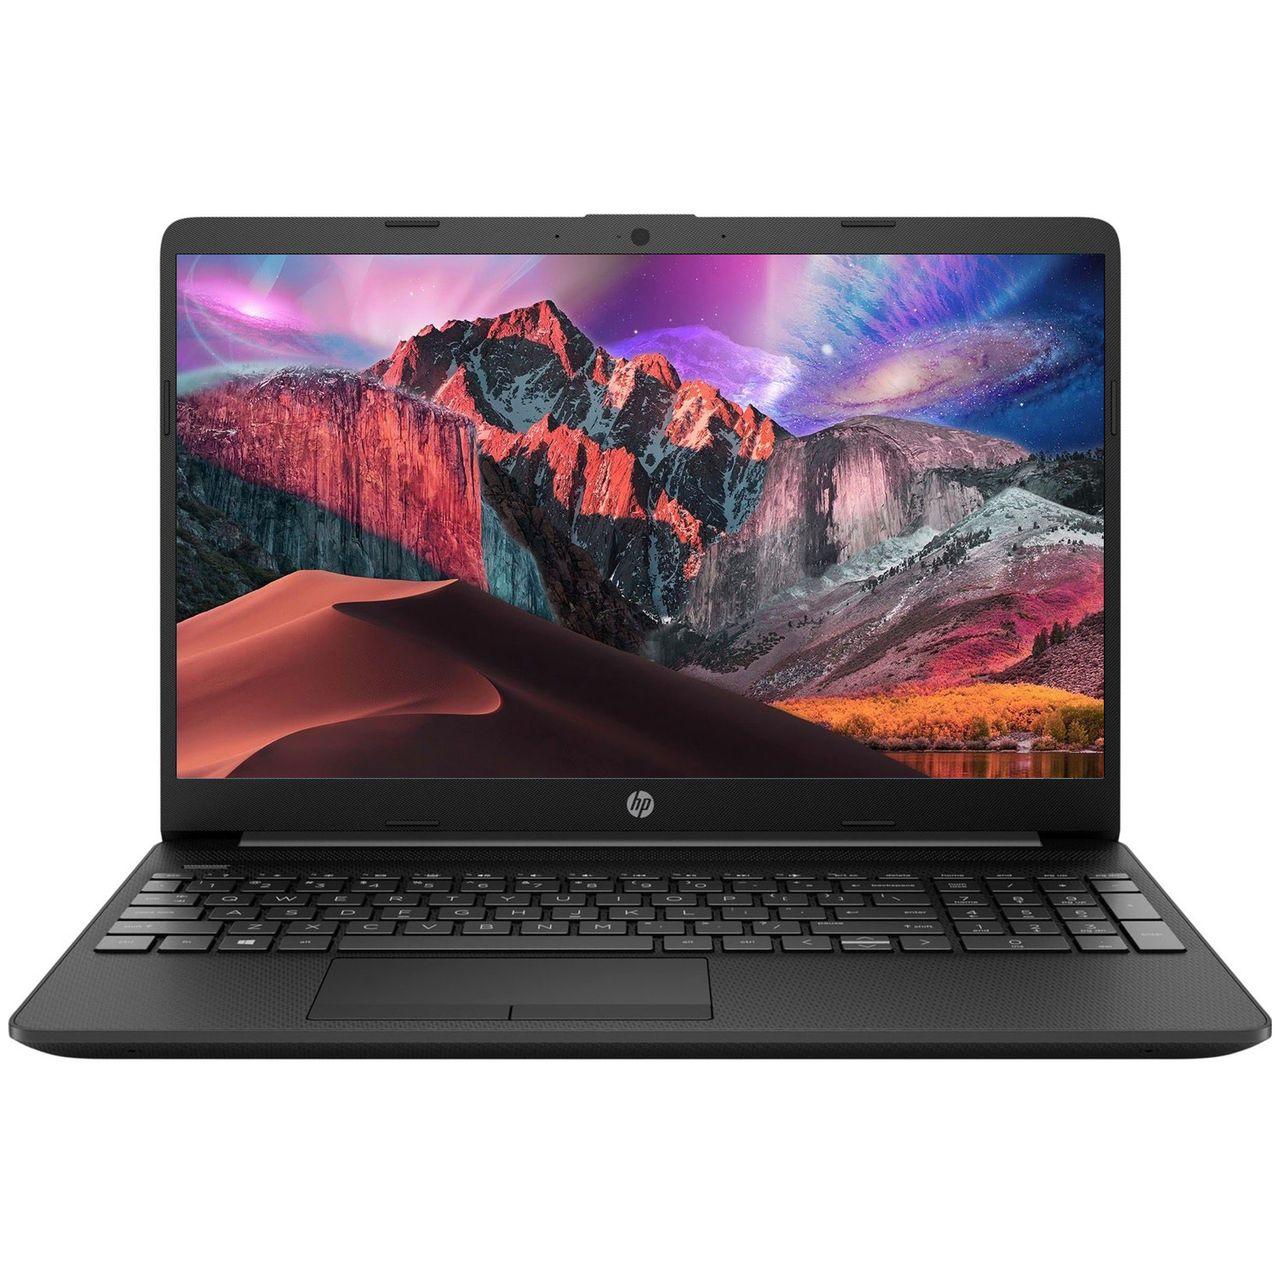 لپ تاپ ۱۵.۶ اینچی اچپی مدل DW2196-B